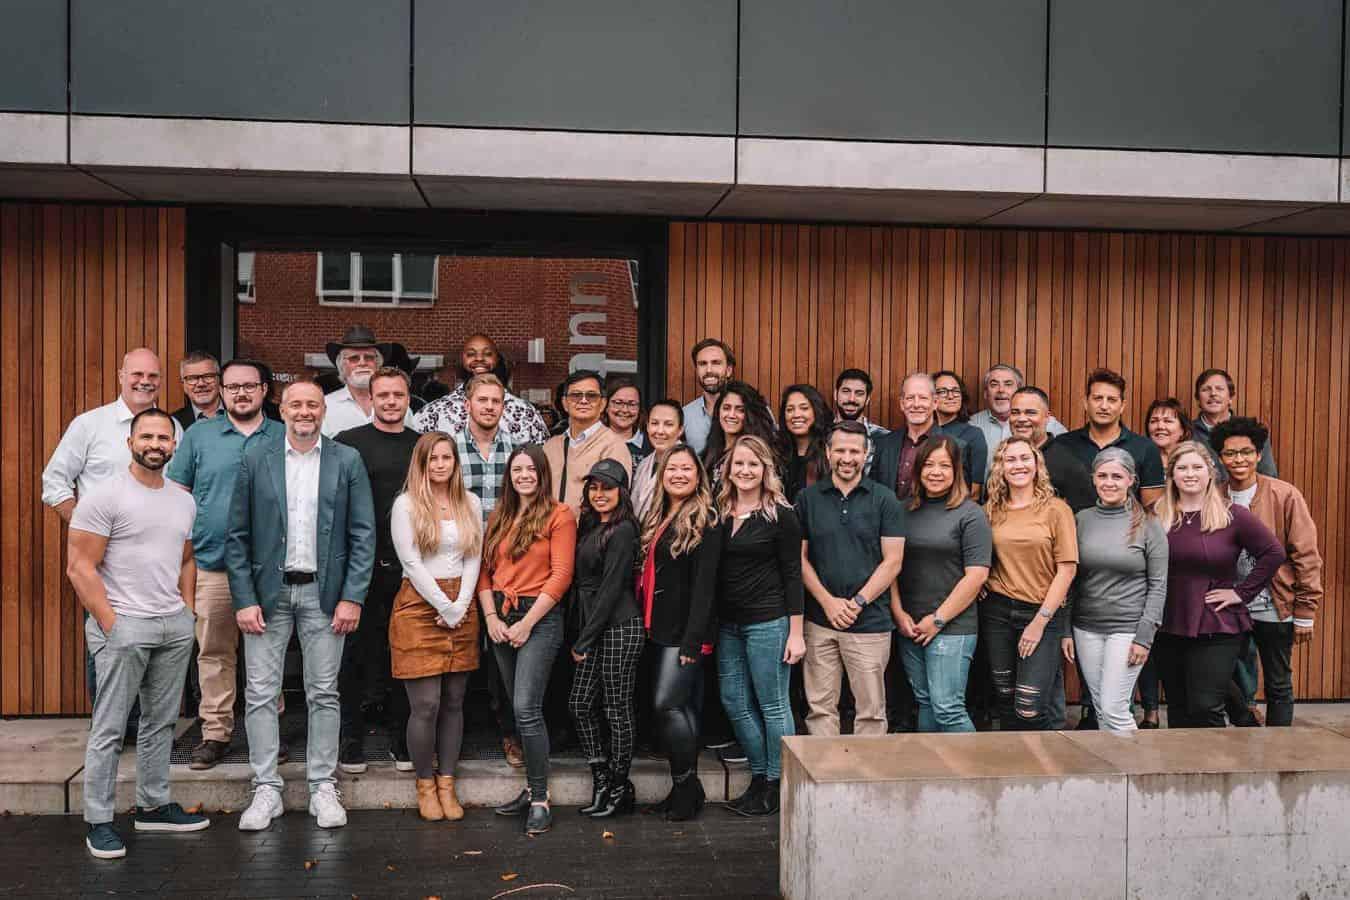 eggersmann & Schmalenbach Factories Tour 2019